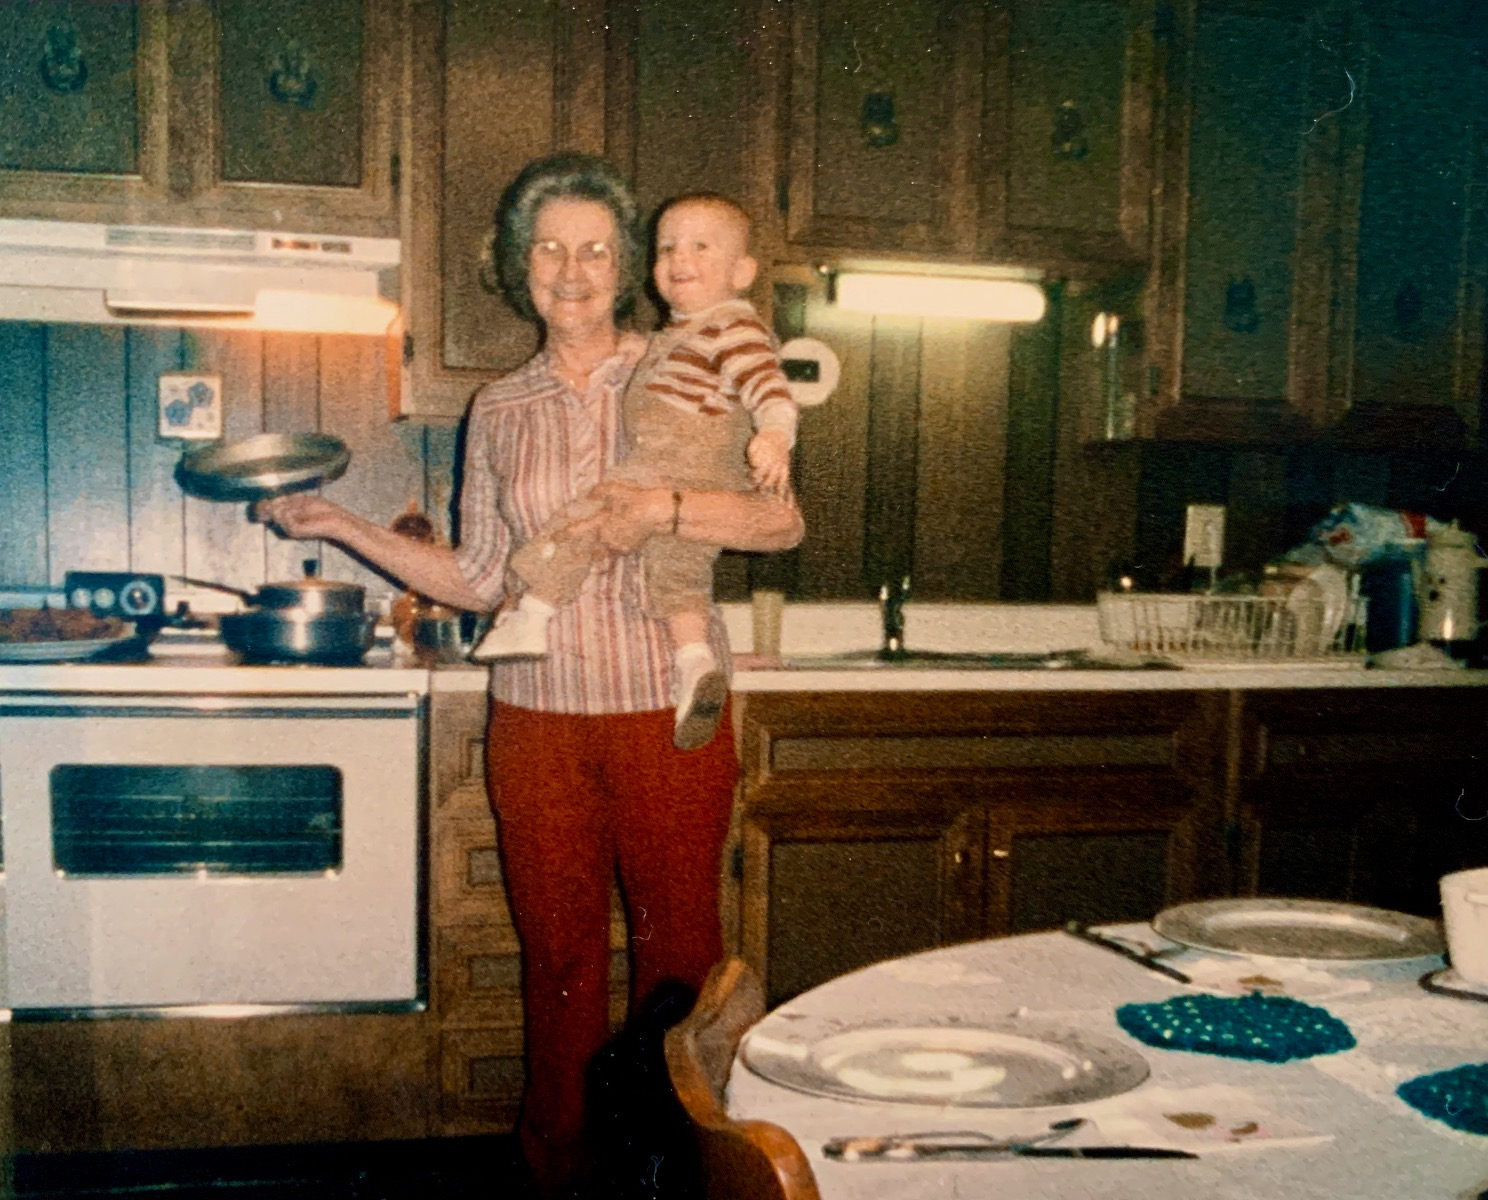 Josh and his Grandma